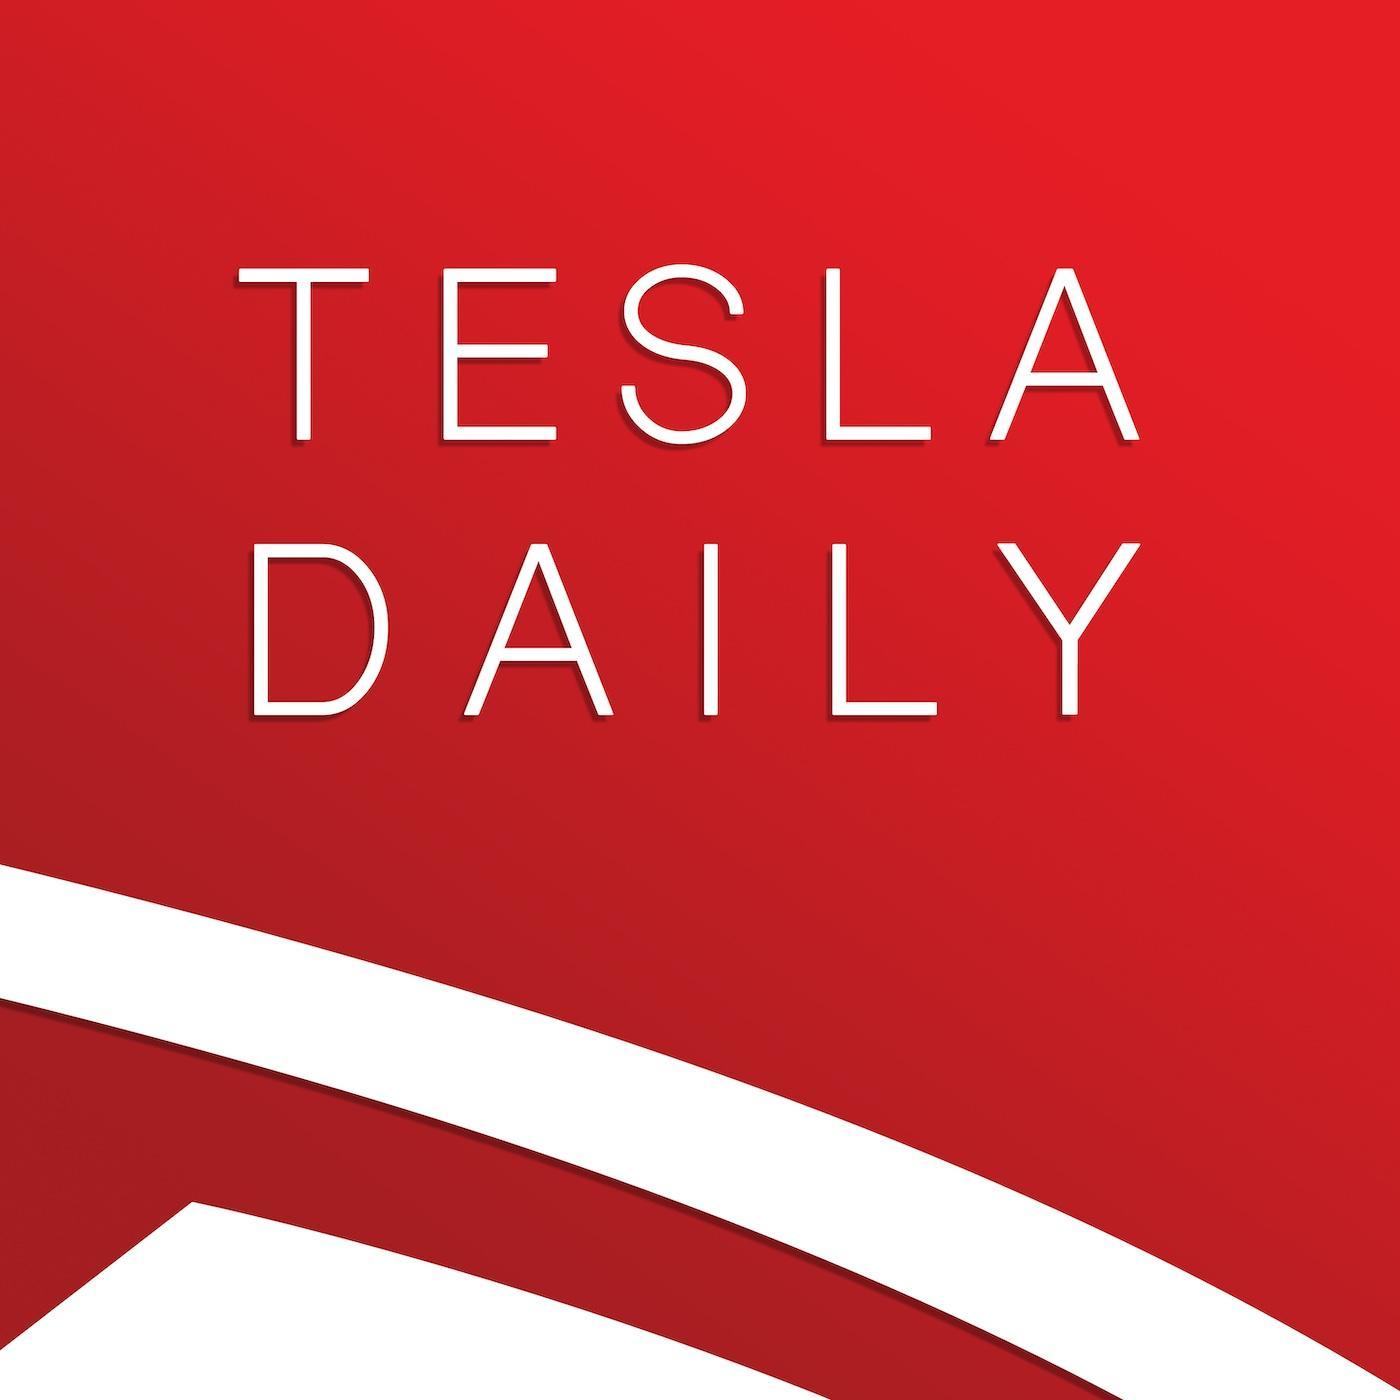 China/Tesla Met About Complaints + Giga Berlin, TSLA Short Interest, Musk 13G/A (02.12.21)